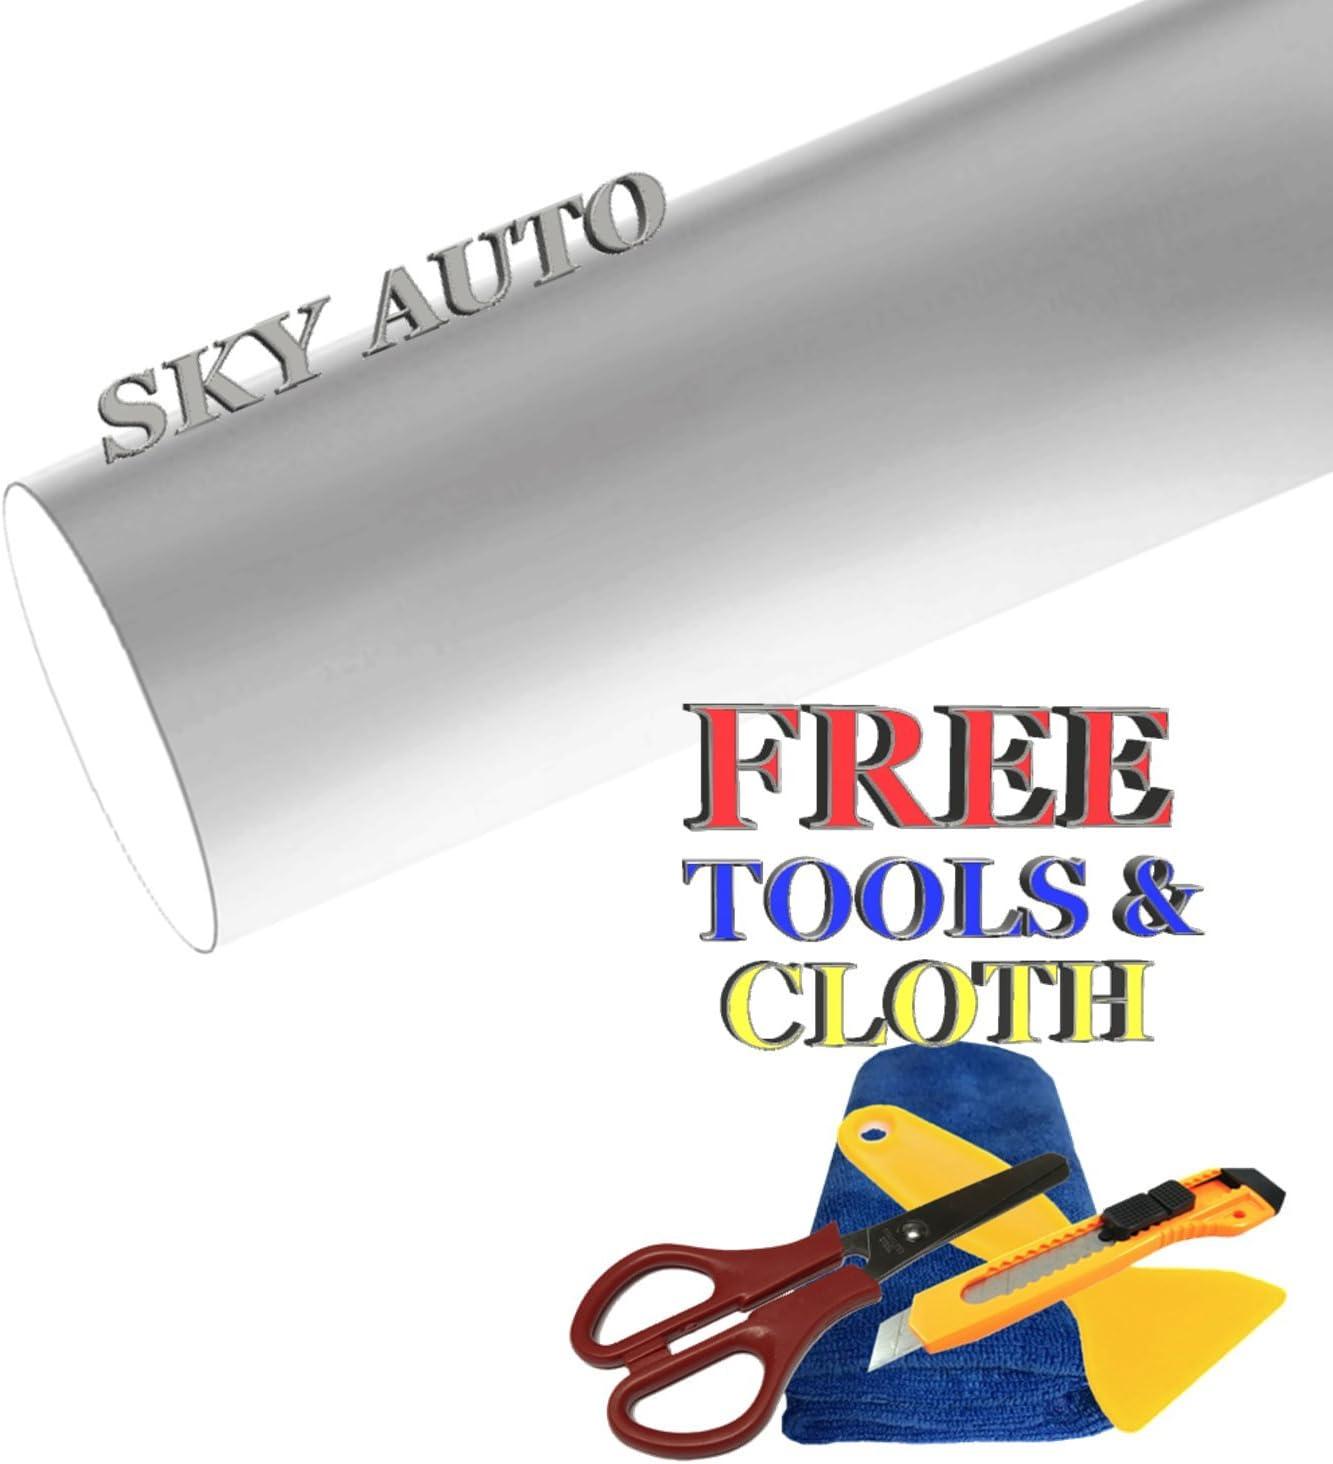 Sky Auto INC Premium Car Max 52% OFF Satin Matte Vinyl W Chrome Plating Inventory cleanup selling sale Film